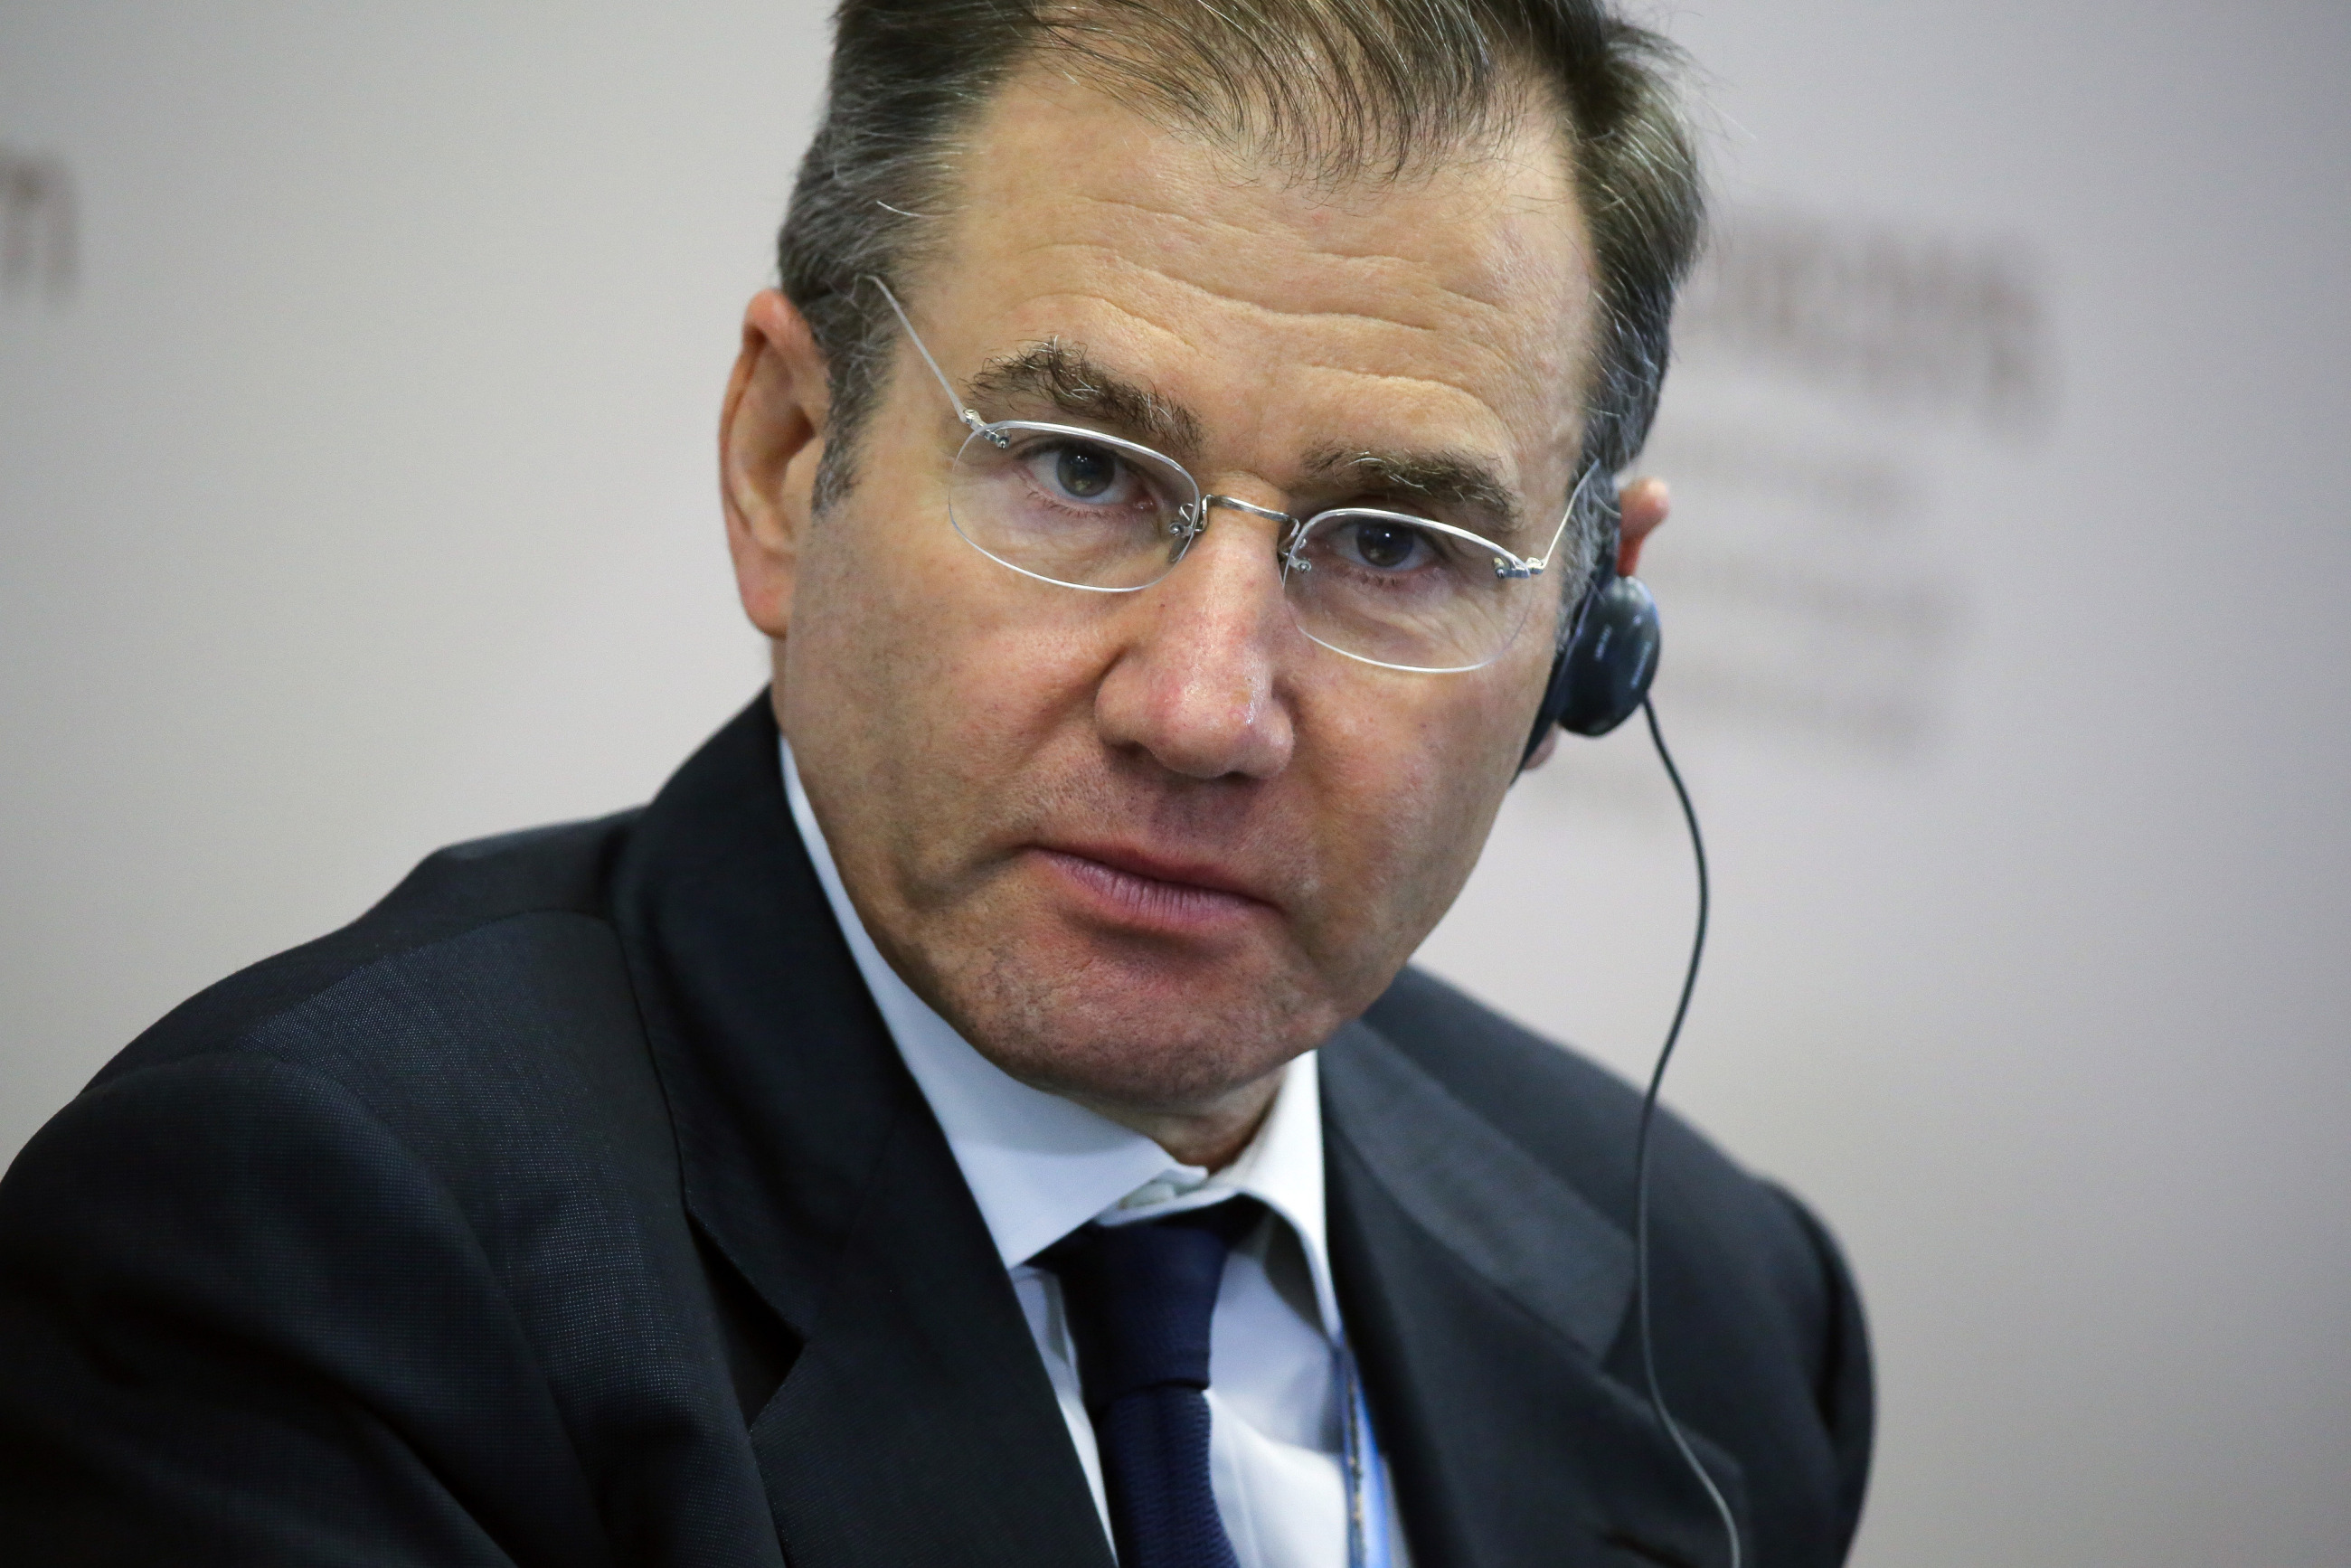 Ivan Glasenberg during a session at the St. Petersburg International Economic Forum on June 19, 2015.